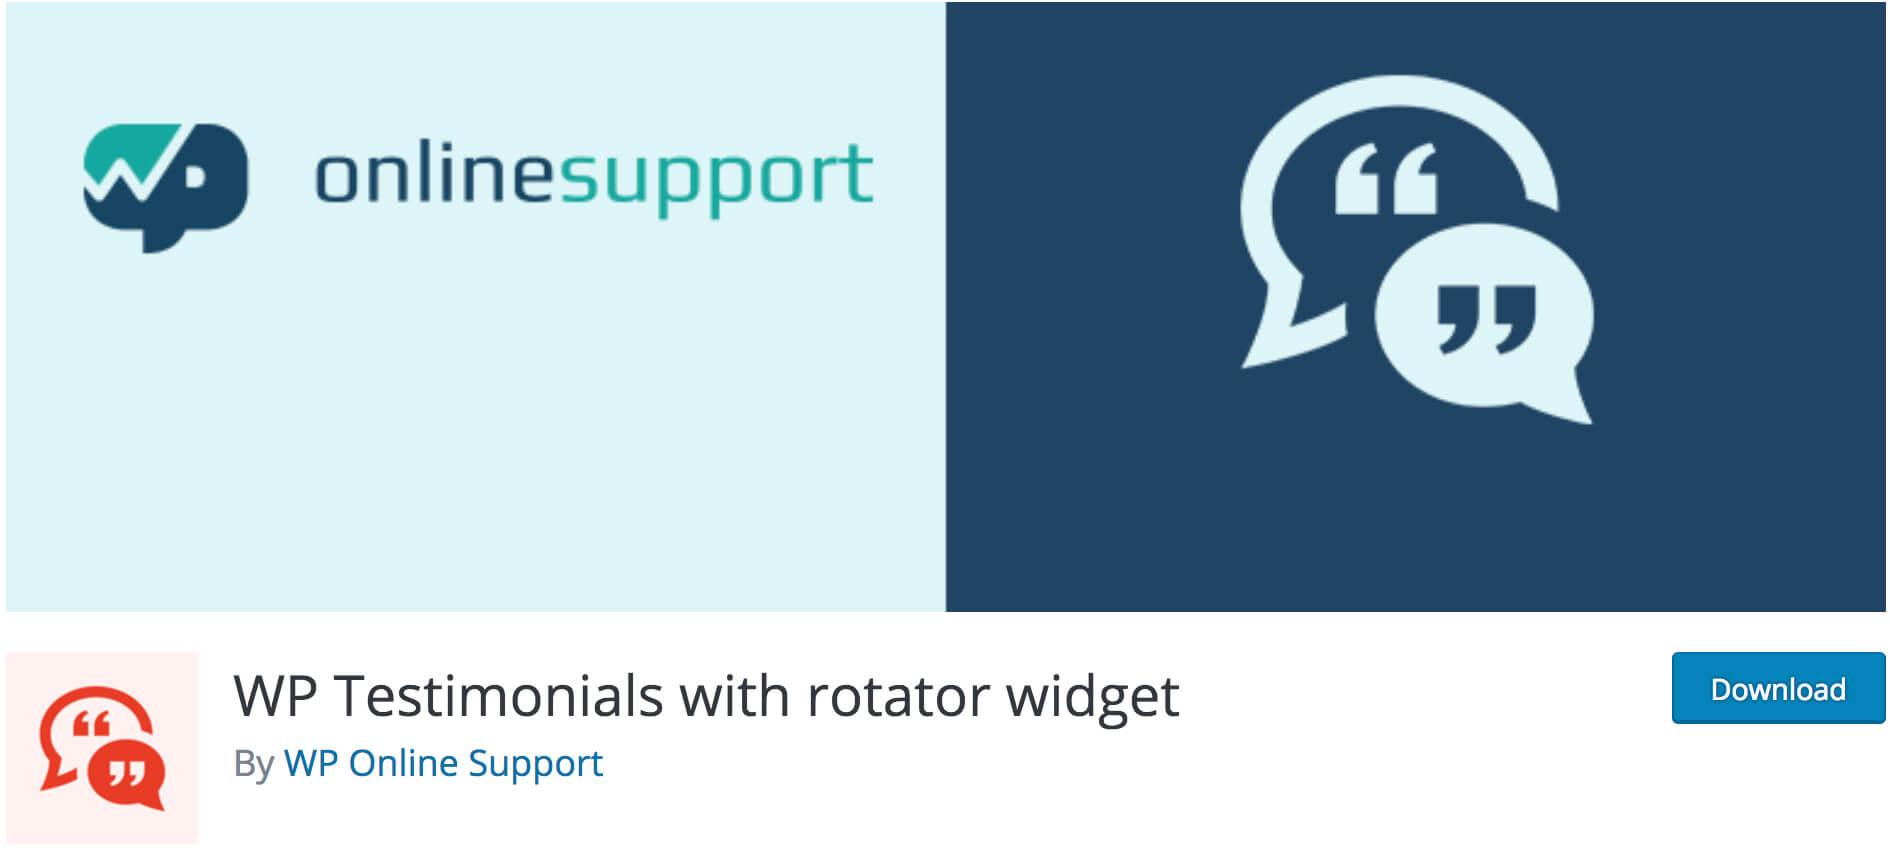 WP Testimonials, Rotator Widget